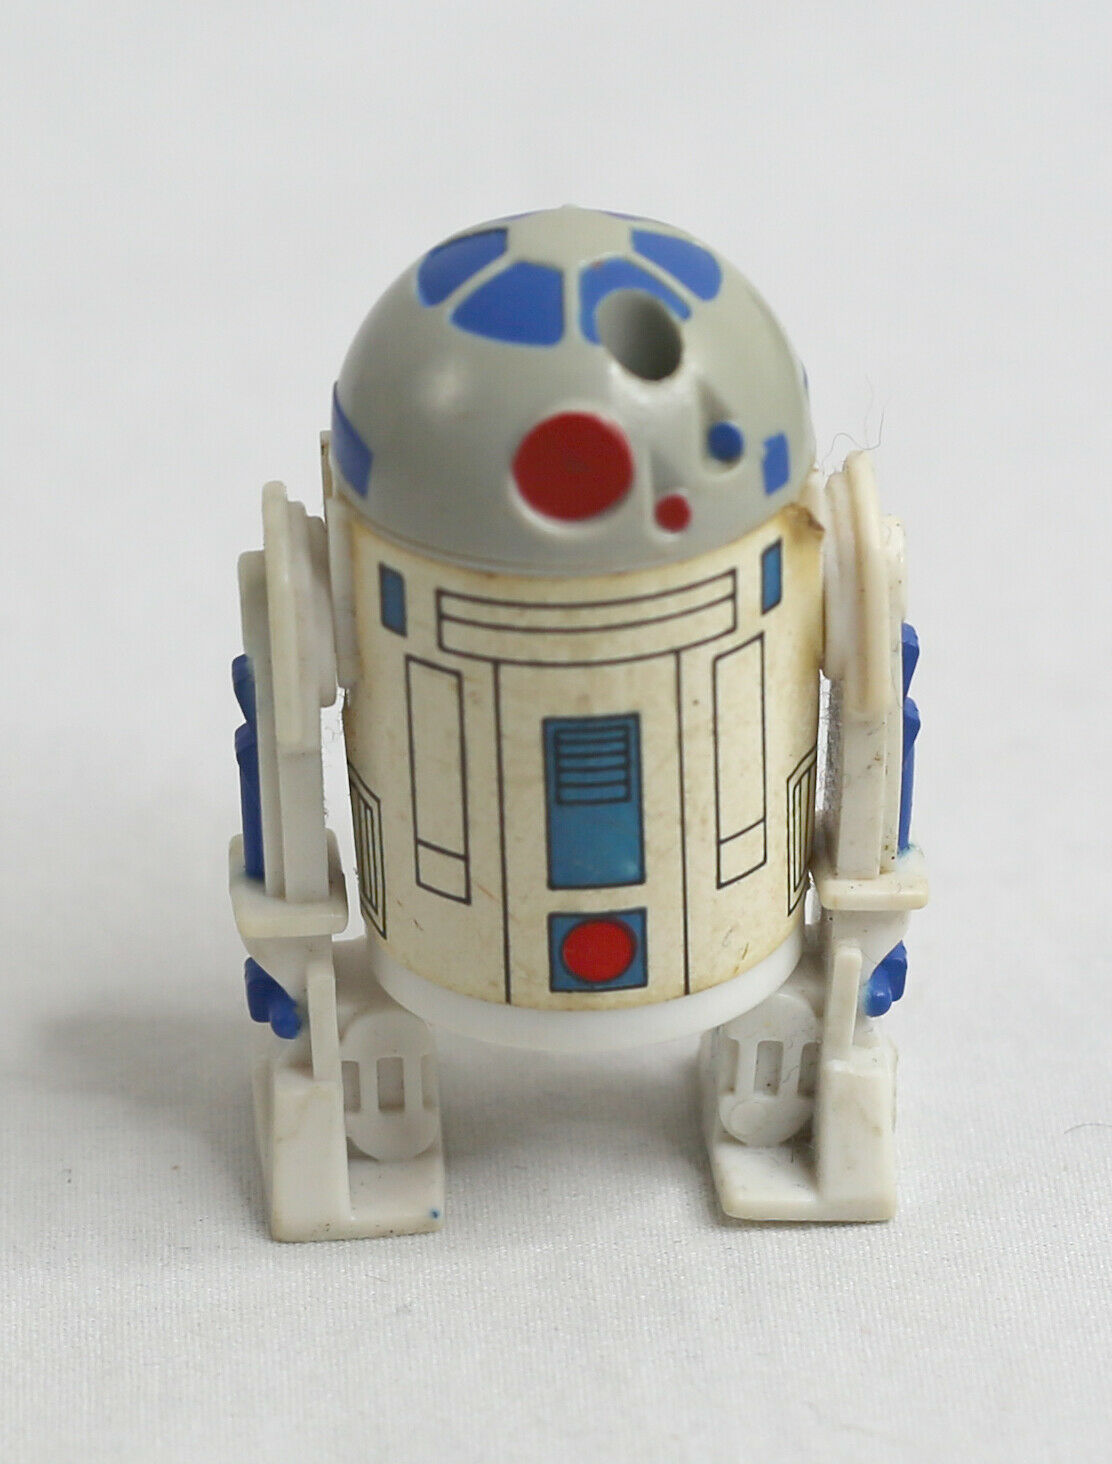 Vintage Star Wars DROIDS Cartoon R2D2 Pop-up Lightsaber Lot - SUPER RARE